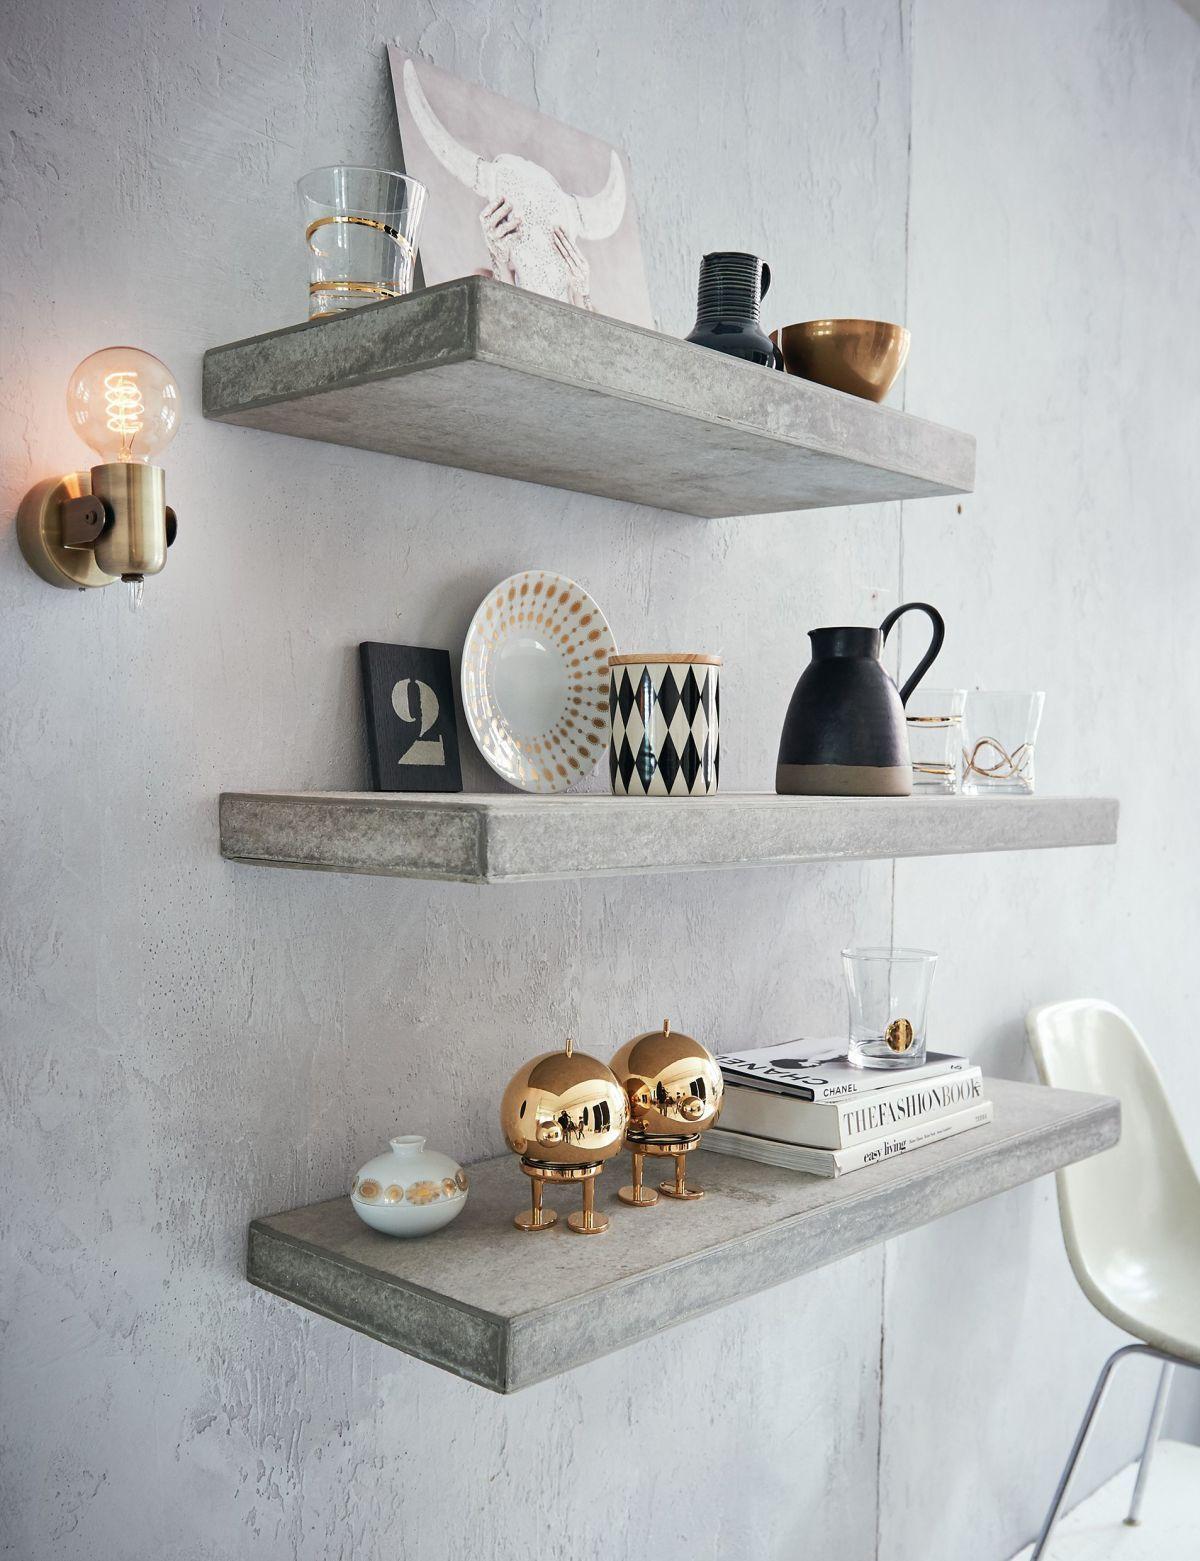 Ein Klassiker Design Wandleuchte Aus Lackiertem Messingfarbenem Metall Wandleuchte Skandinavische Wohnraume Betonoptik